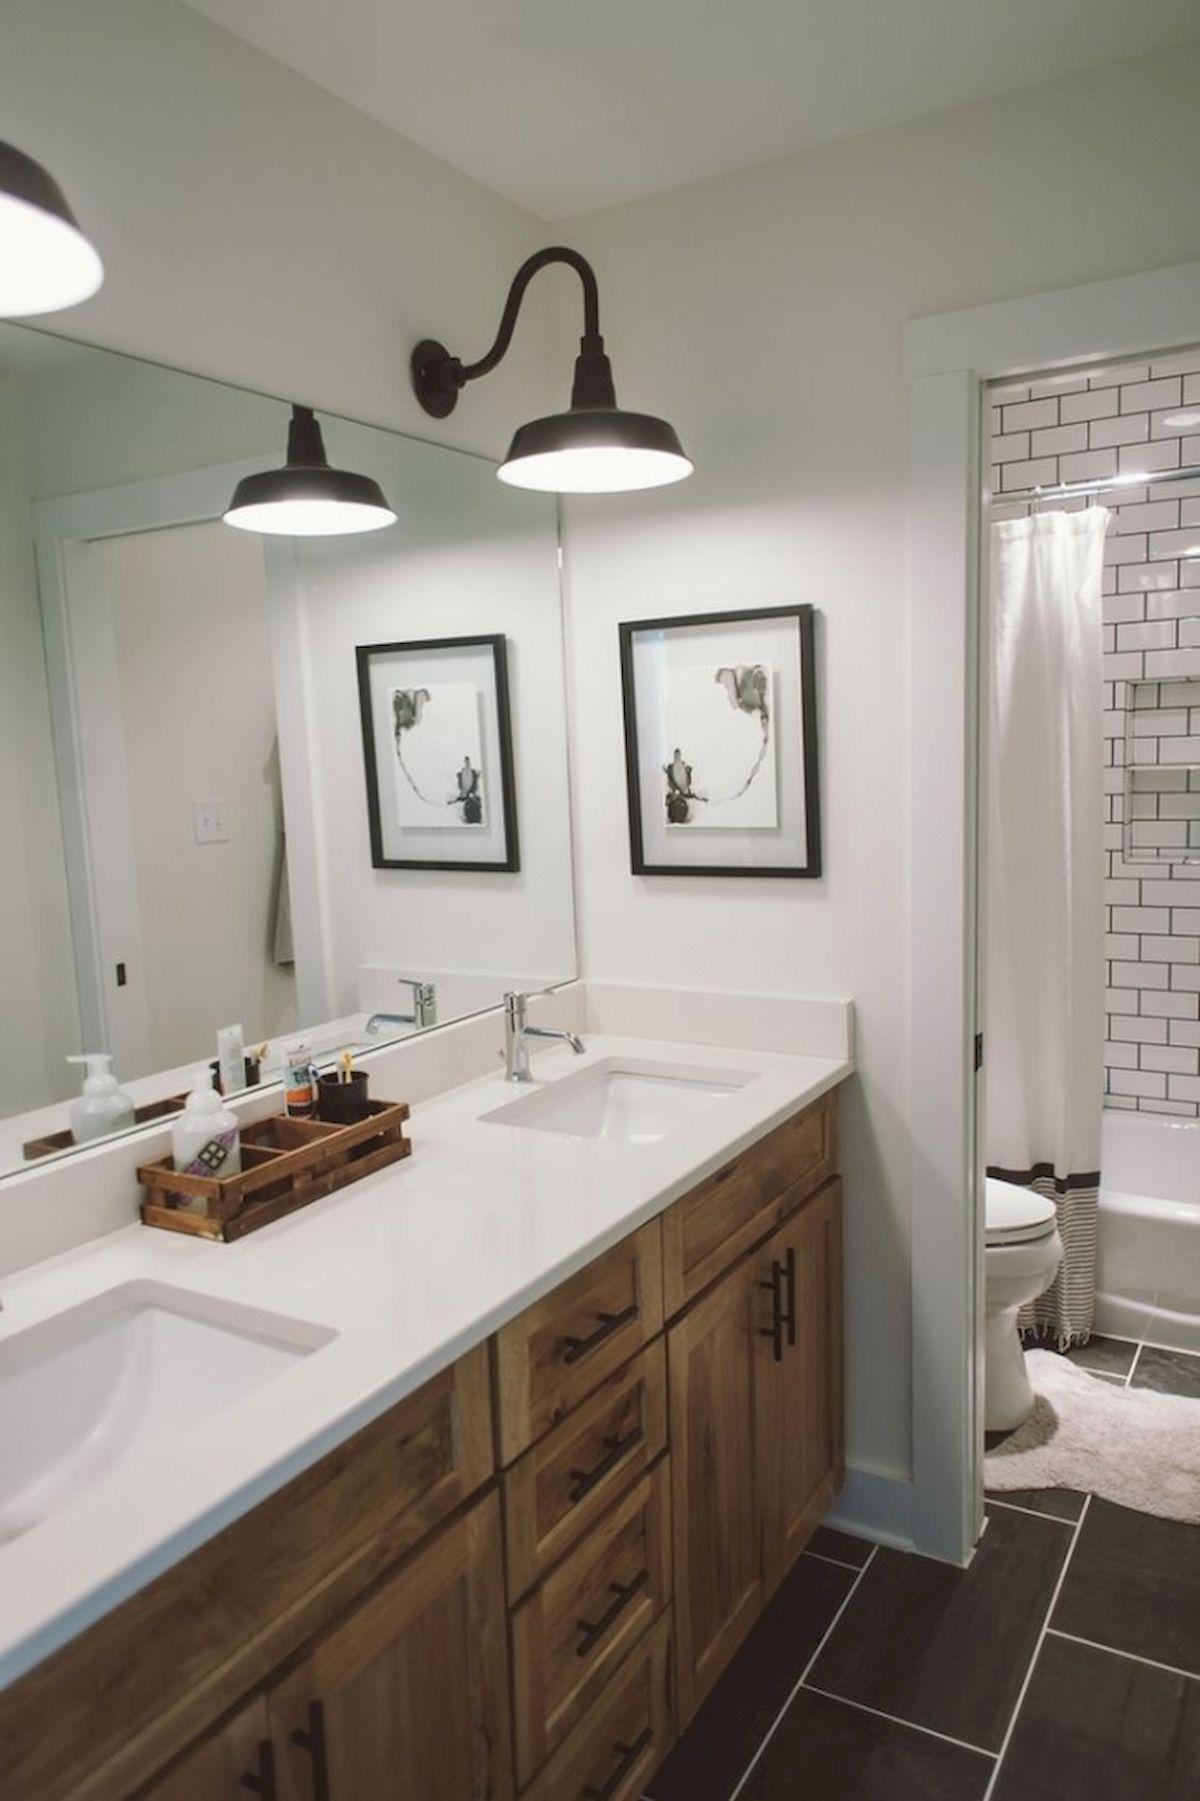 55 Bathroom Lighting Ideas For Every Design Style